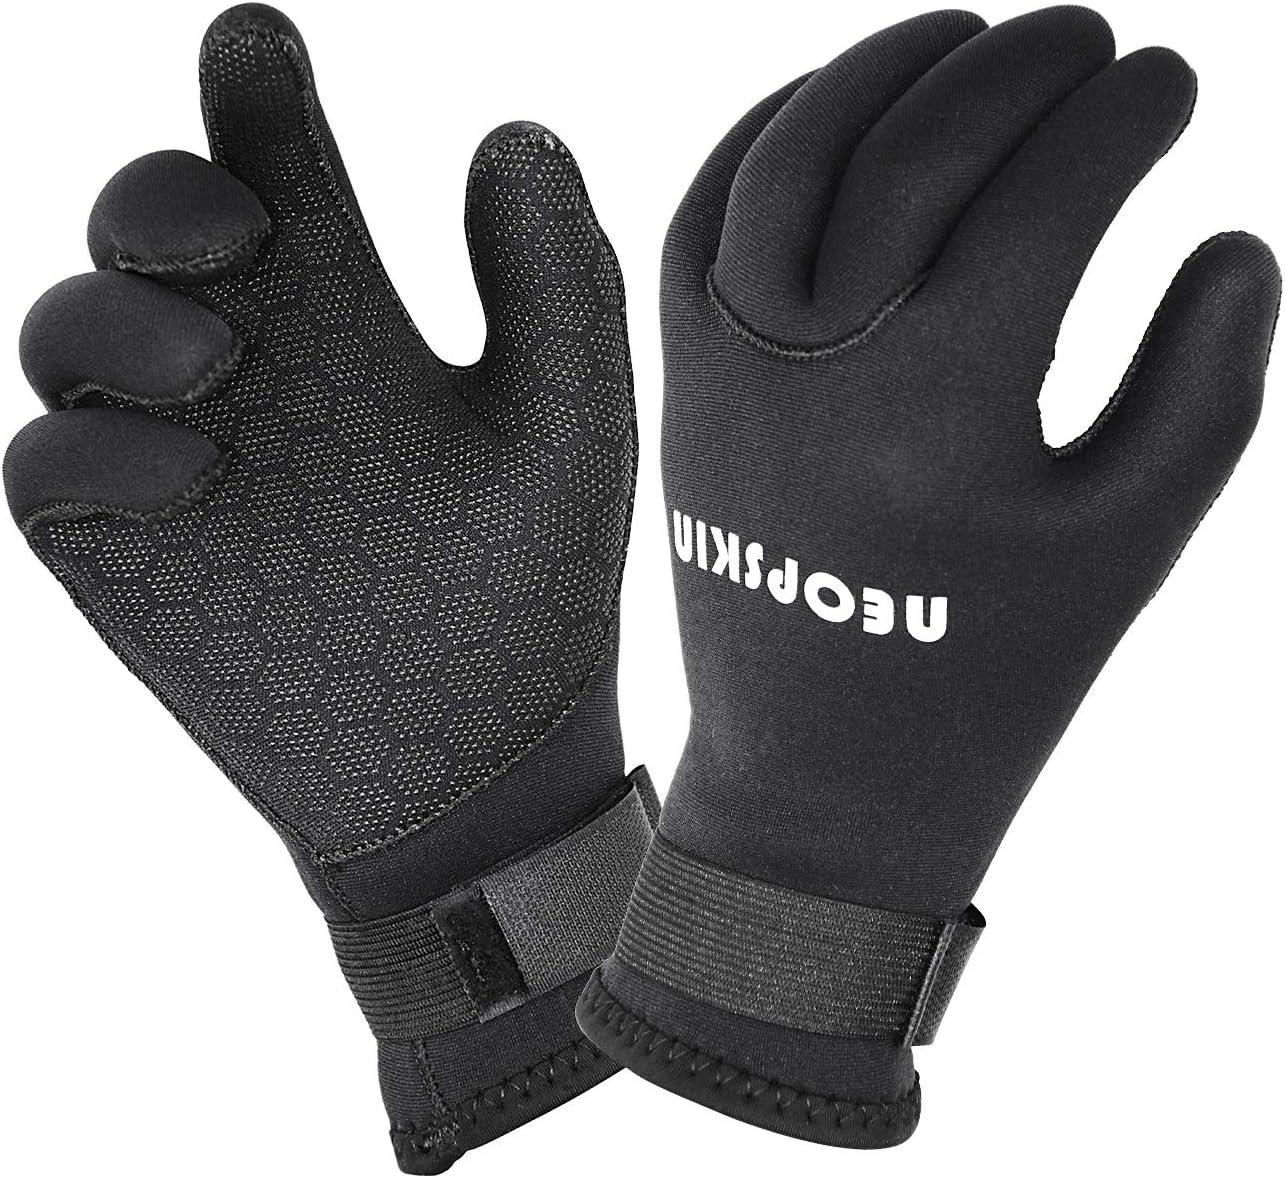 3MM Neoprene Wetsuit Black Gloves Diving Swim Scuba Surf Snorkeling Cold-proof